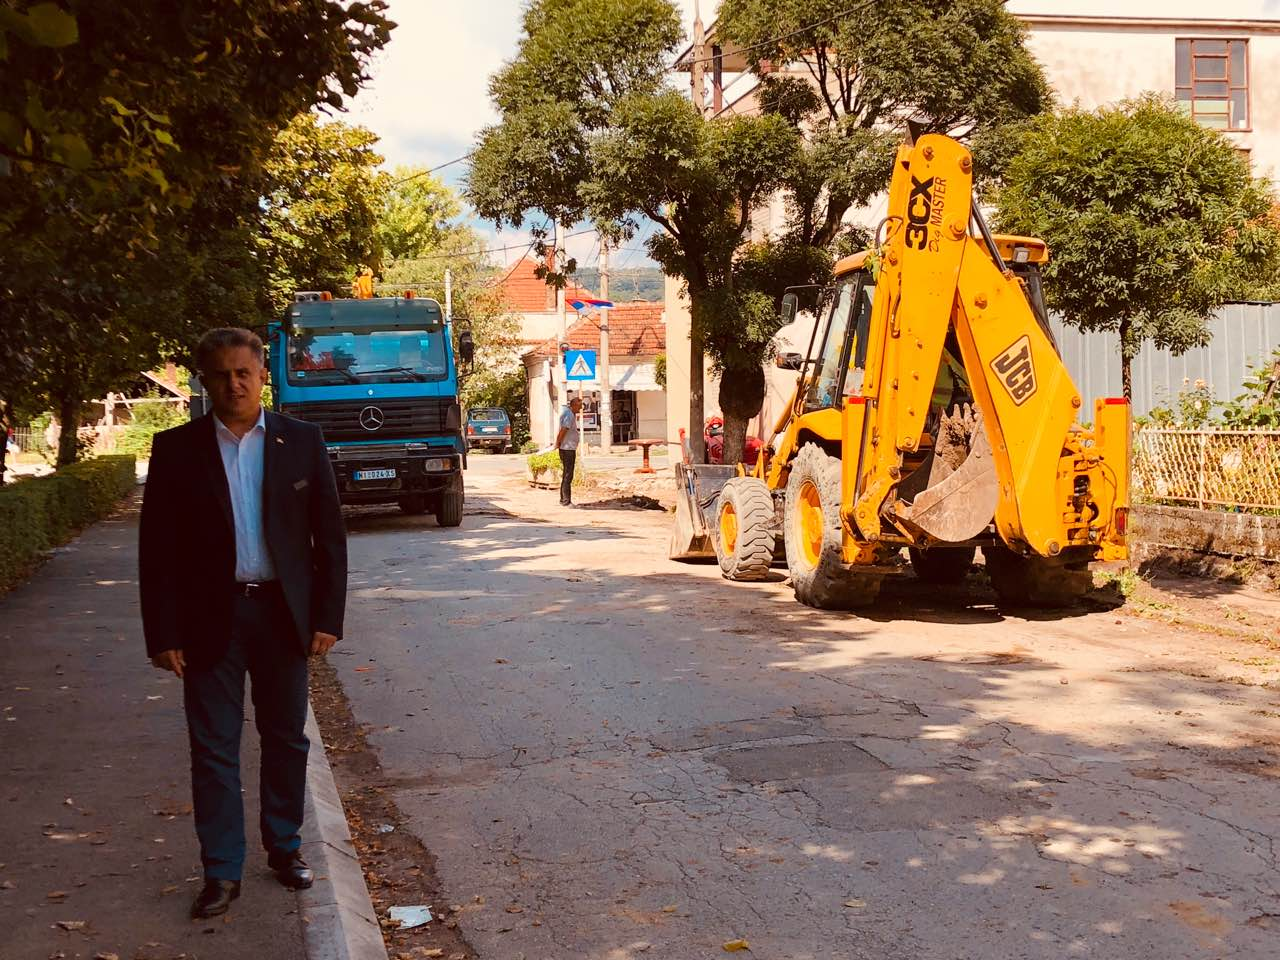 Narodni poslanik Miletić obilazi gradilište, foto: N.S. / Svrljiške novine